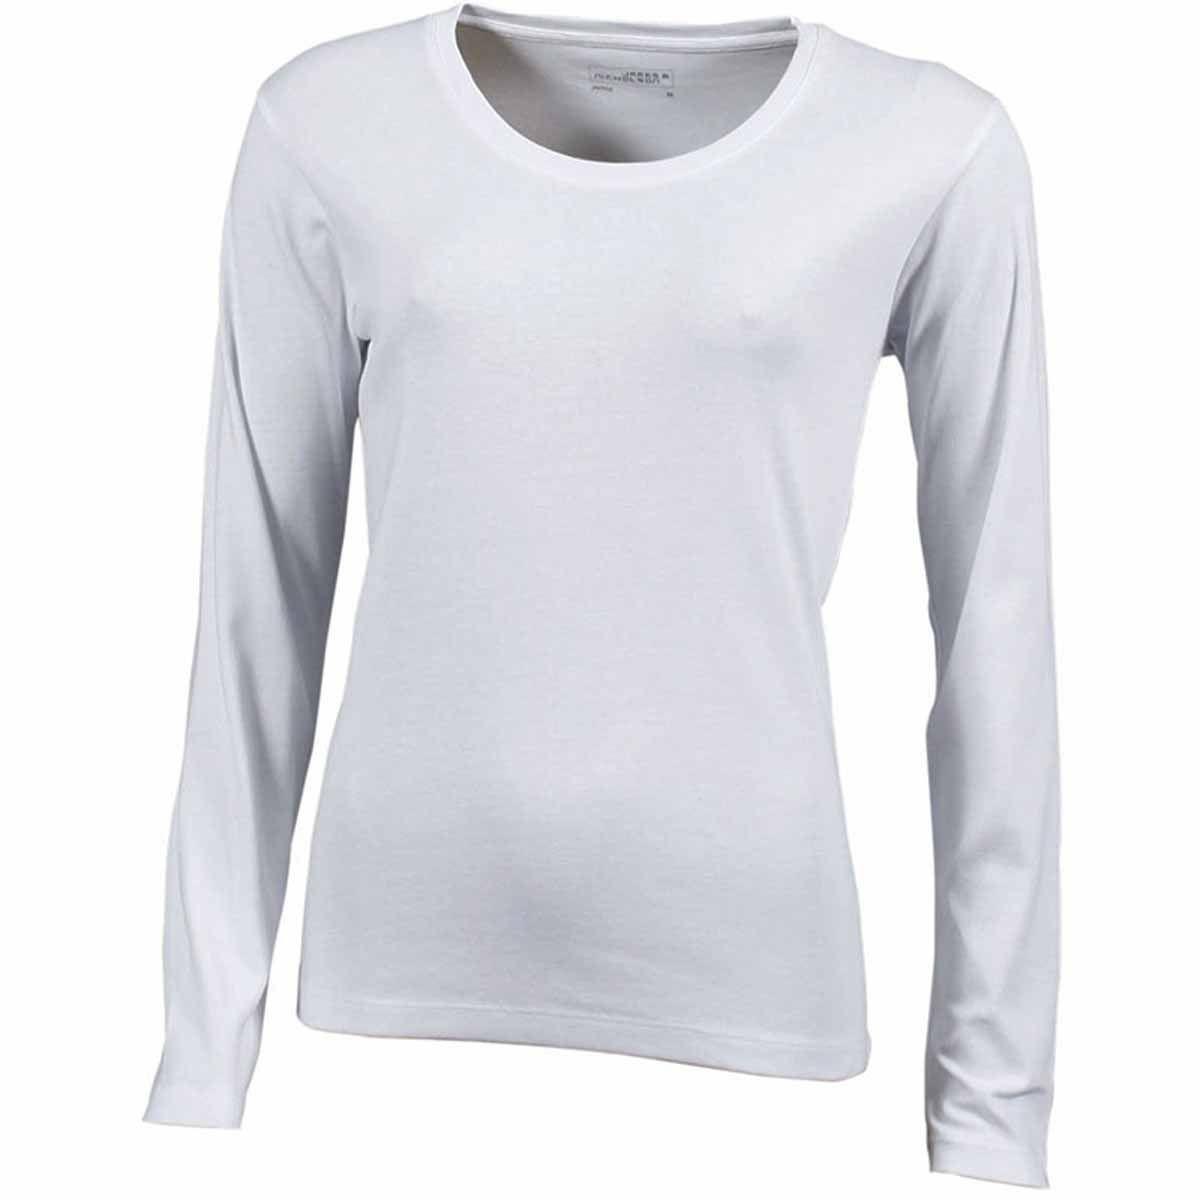 a8f219977be0 T-Shirt Femme Manches Longues - Jn906 - Blanc - Coton Extensible ...